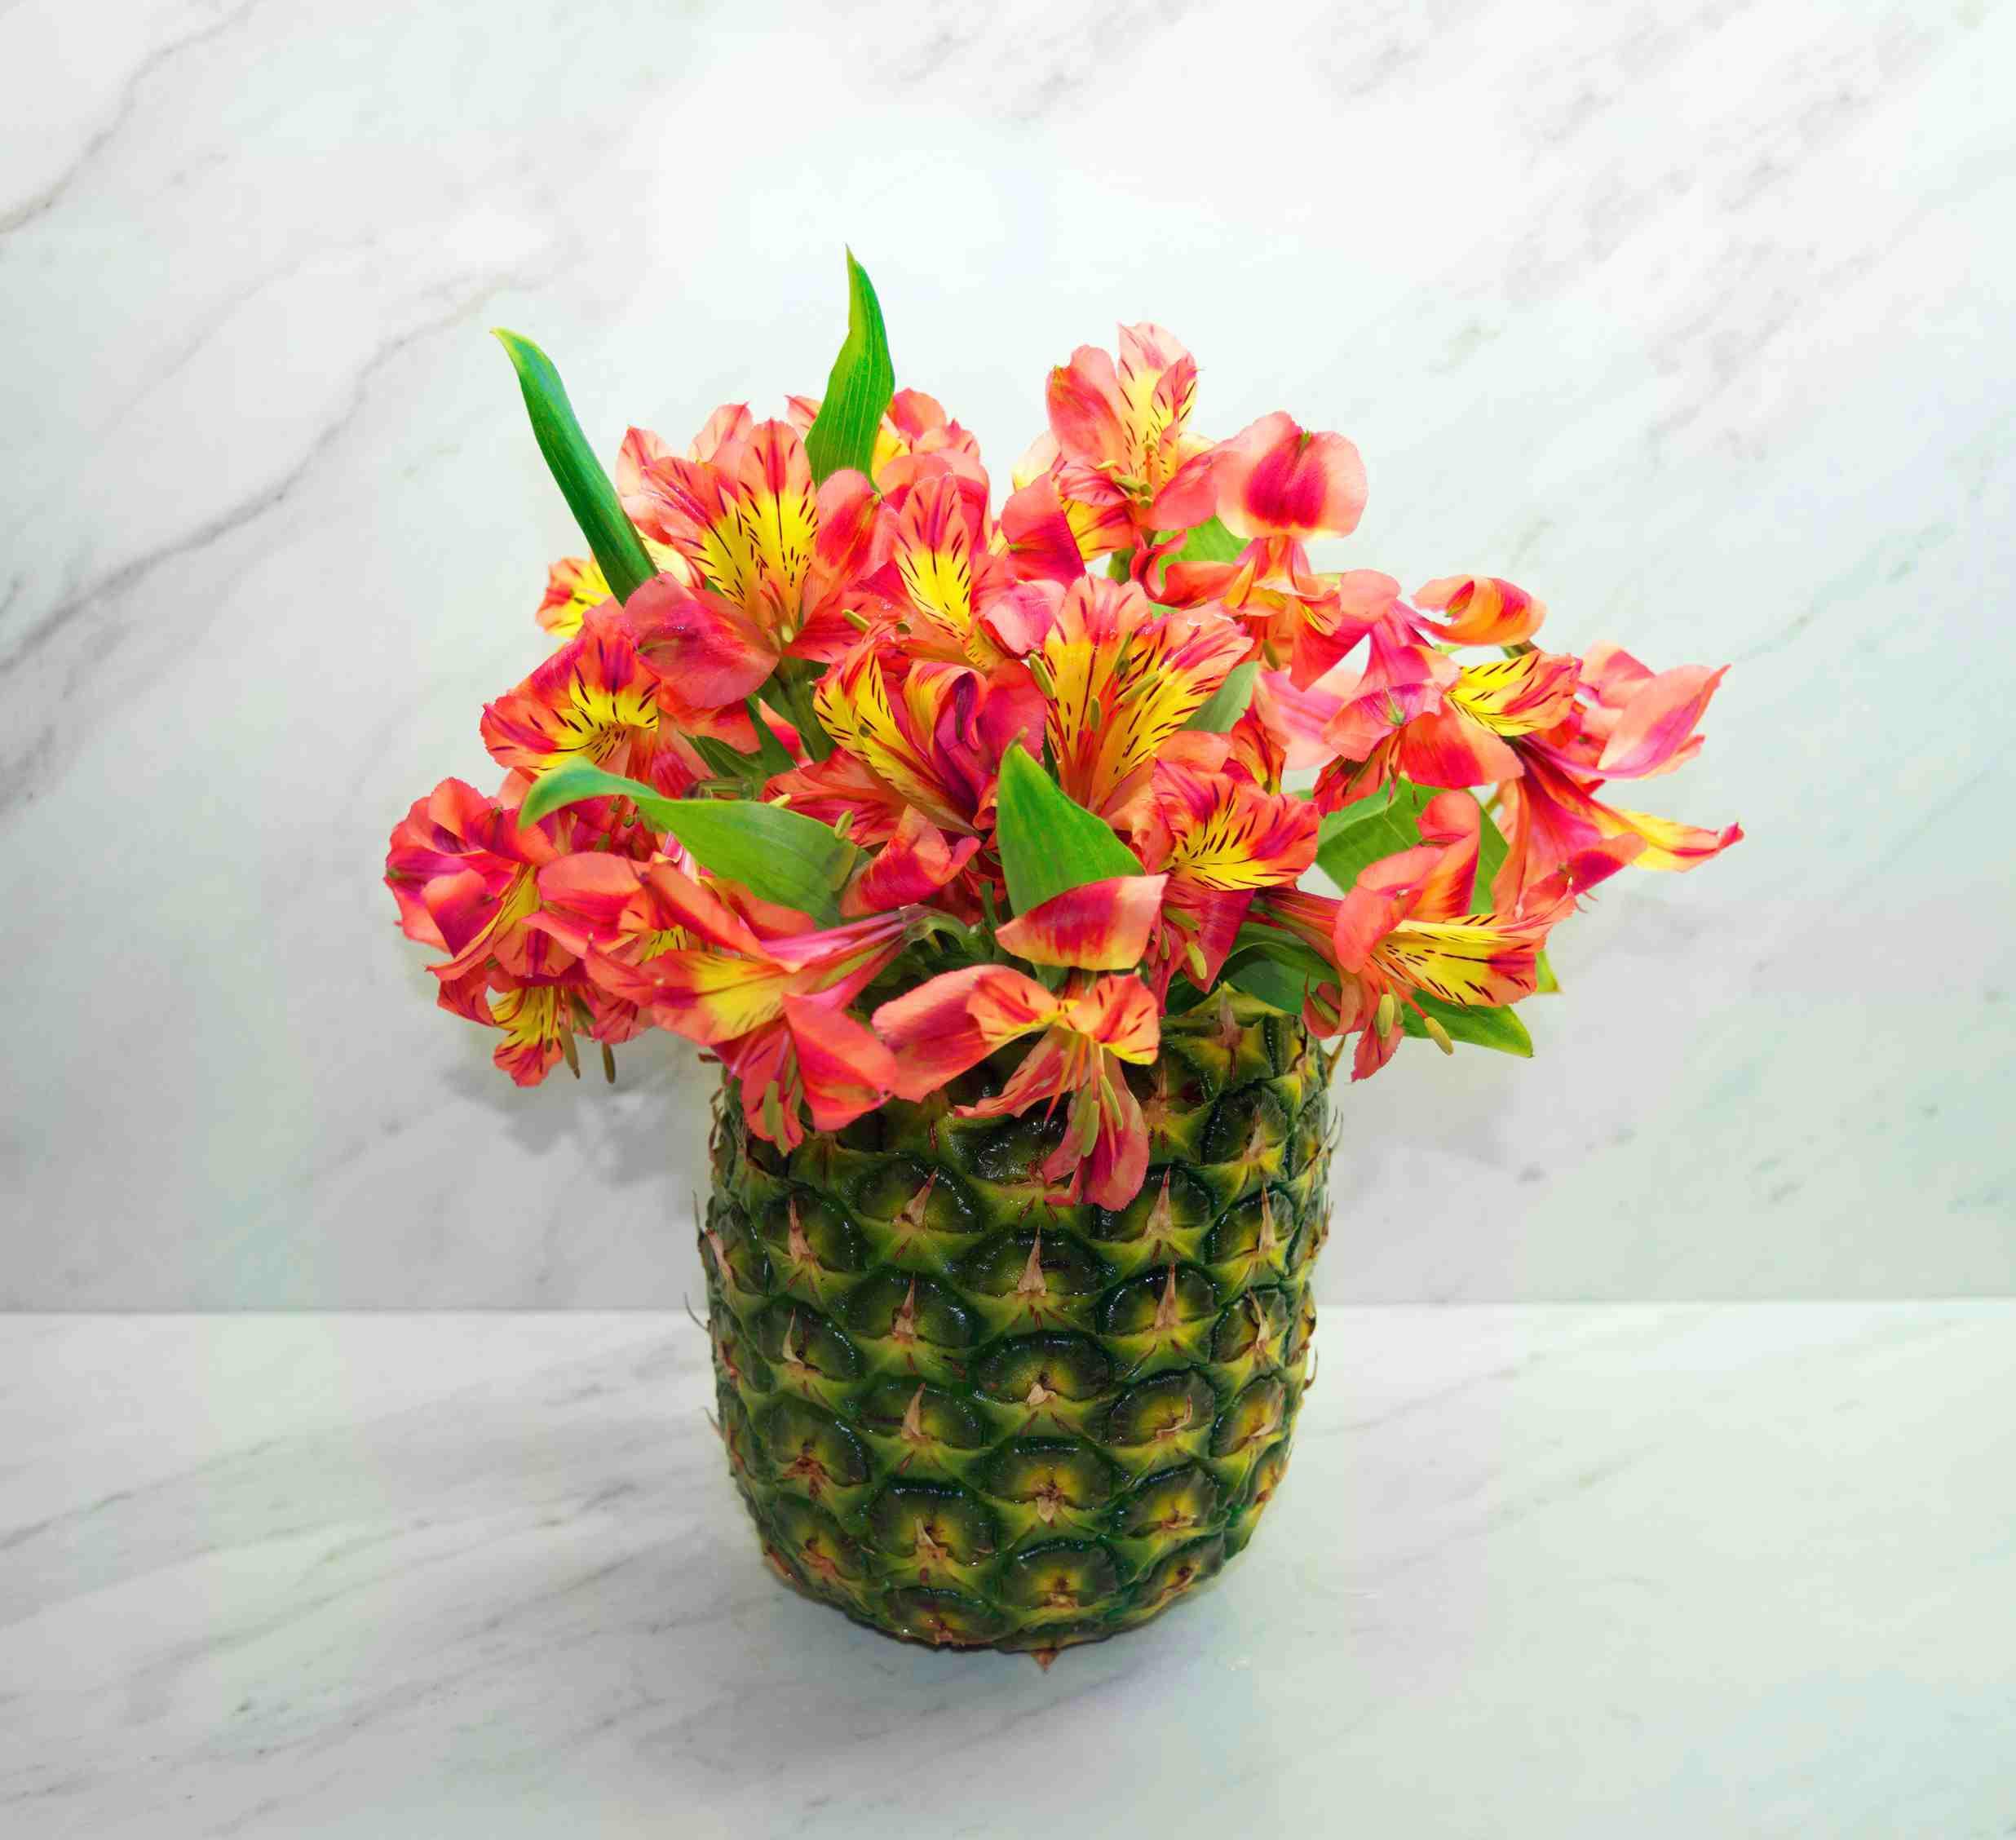 fake flowers in glass vase of diy pineapple vase floral arrangement regarding diy pineapple vase 56a262c53df78cf77274f3c3